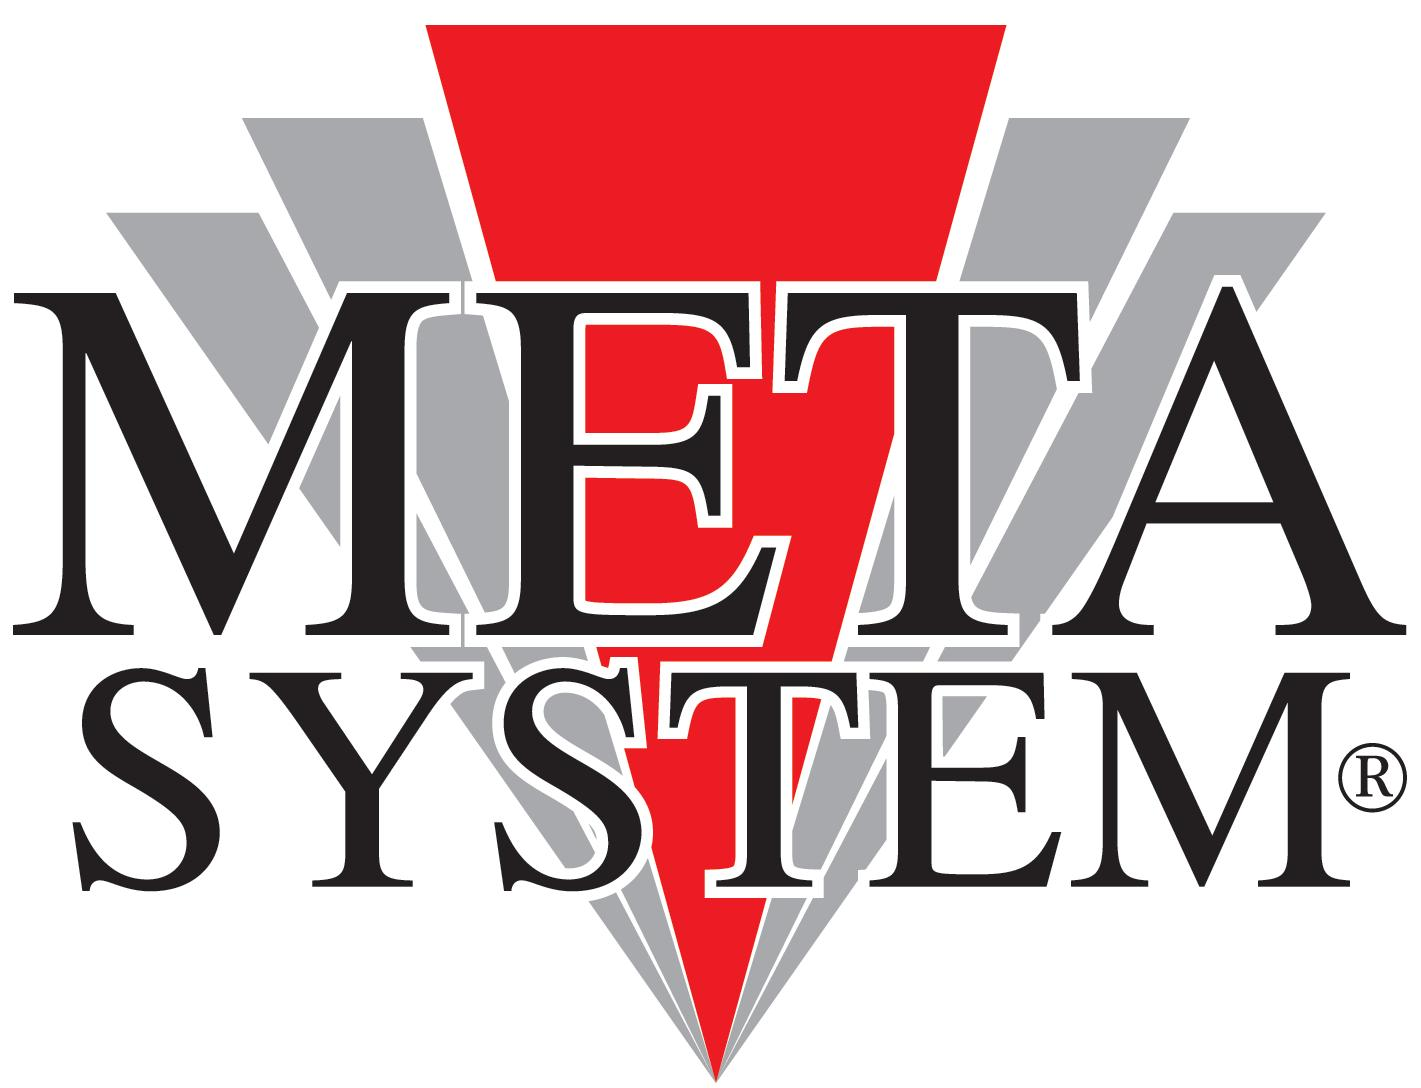 Metasystem, installé par SARL BONNEL